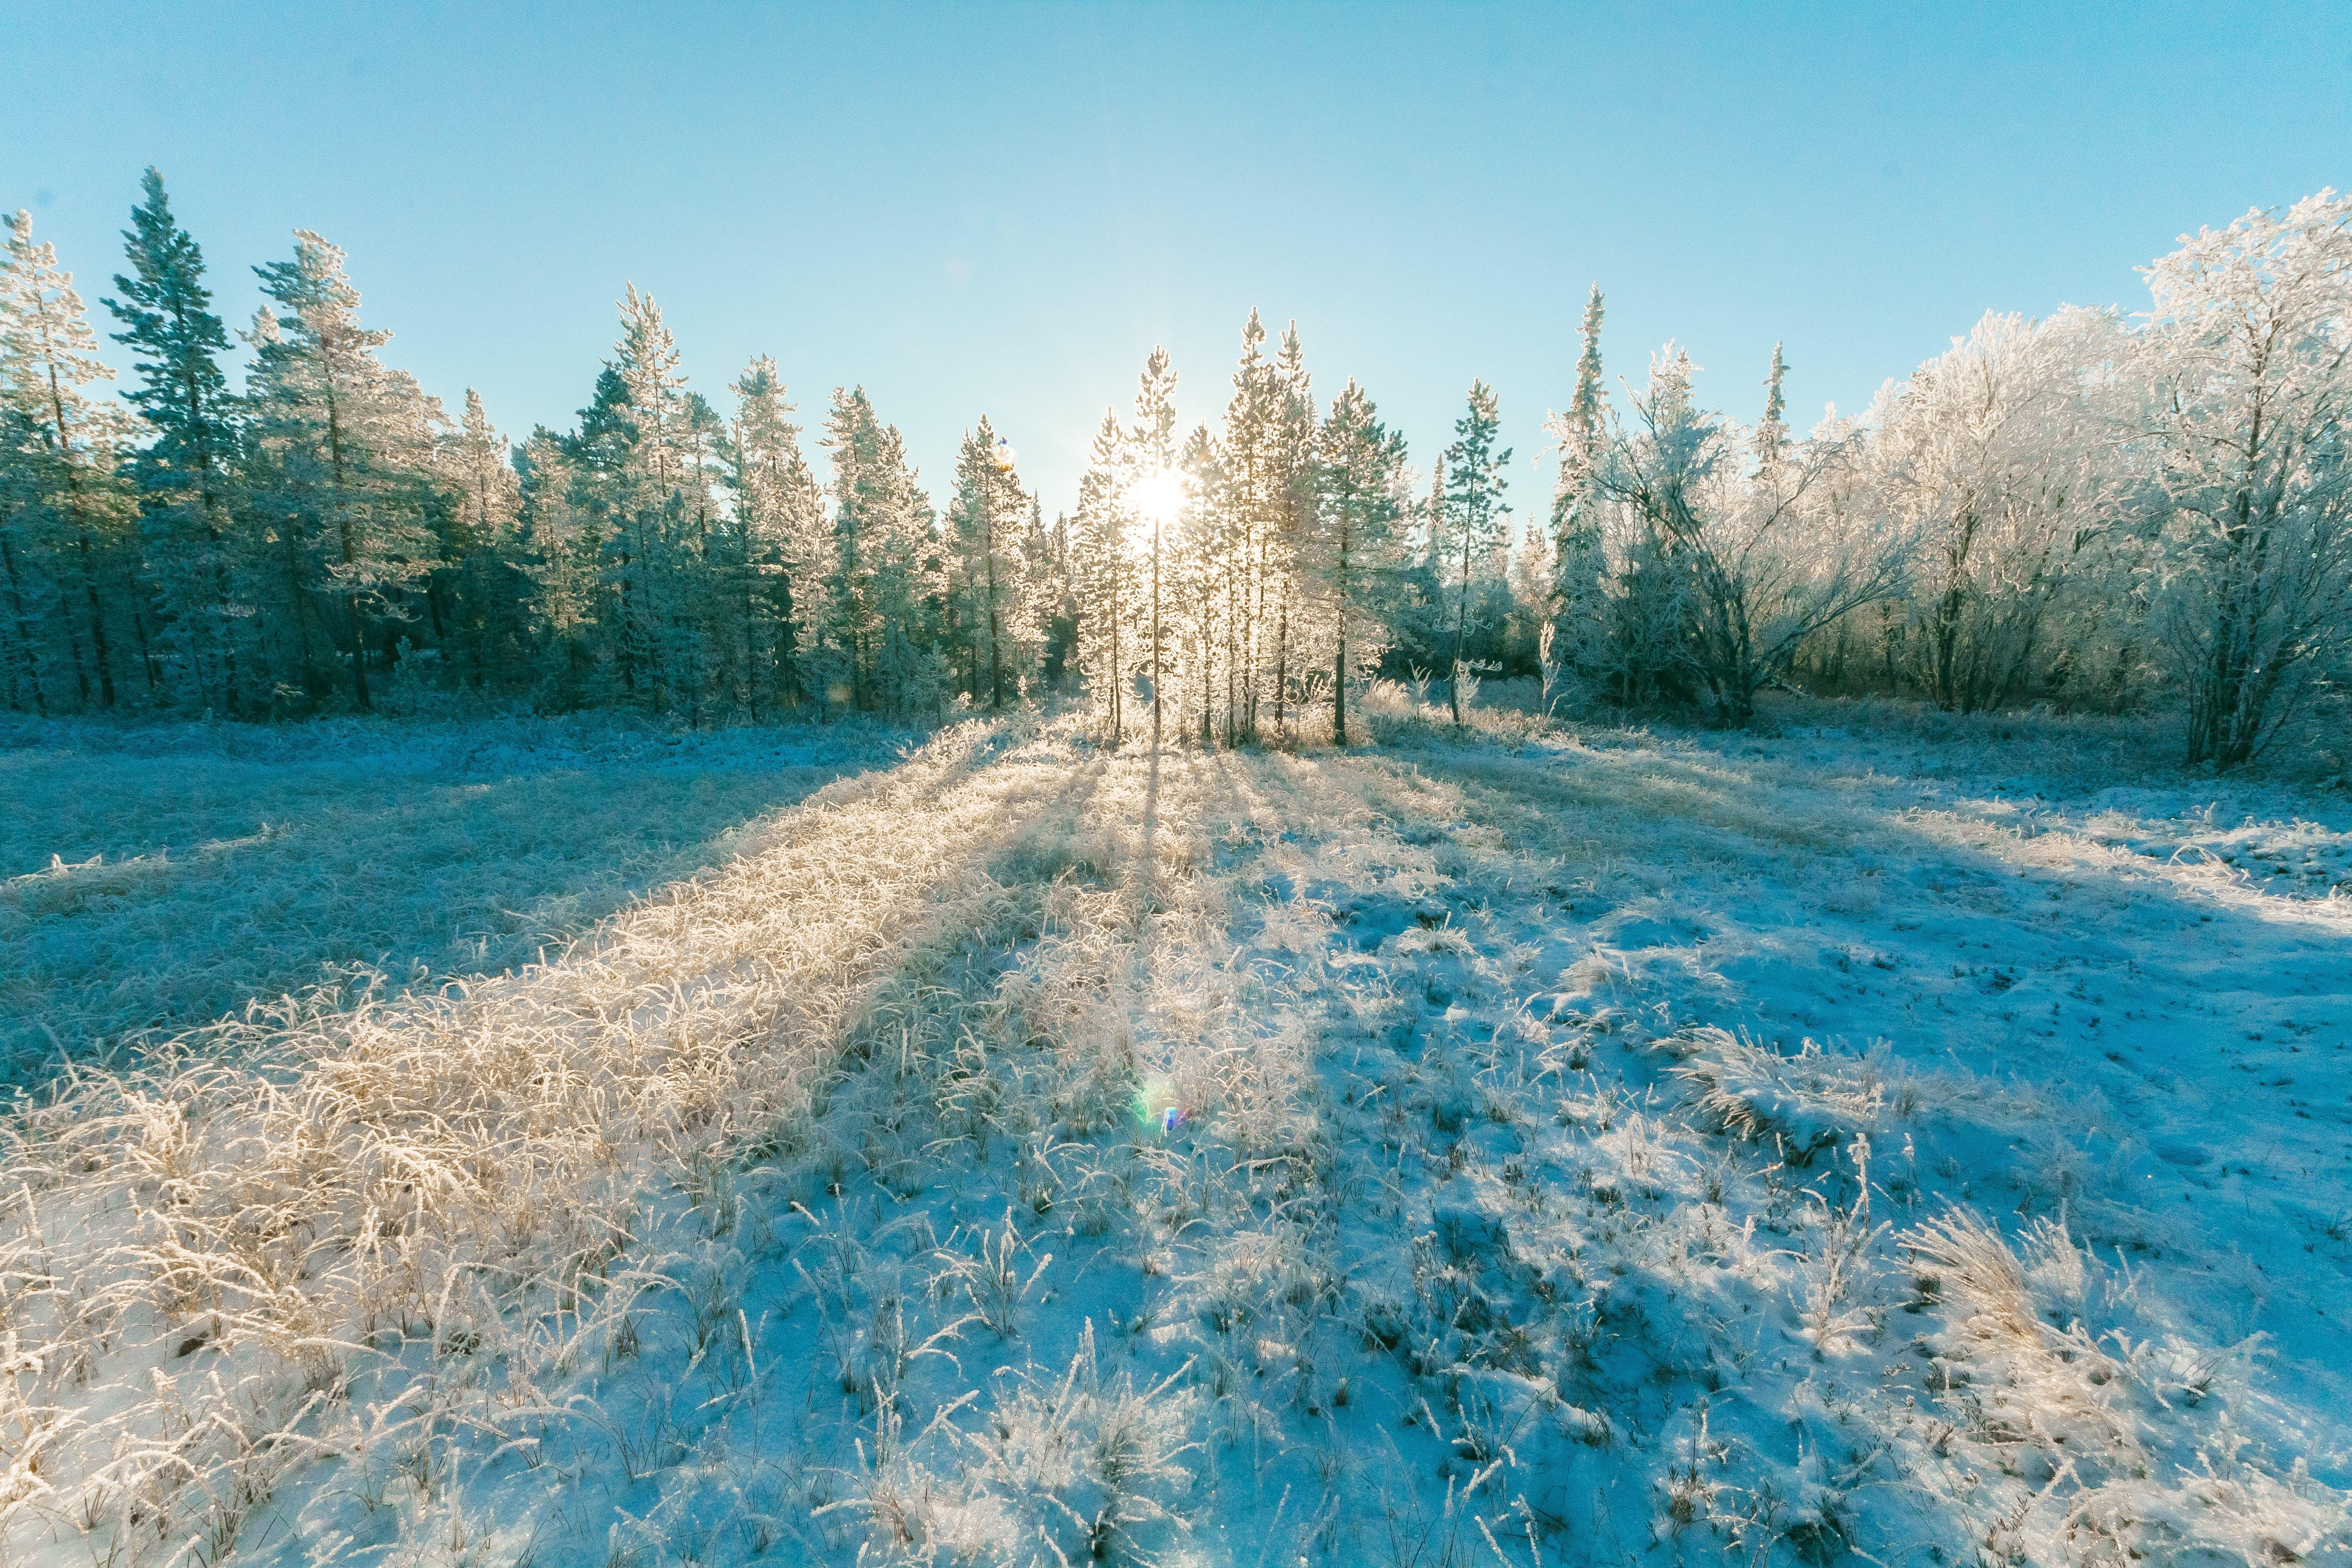 Landscape Photo of Sun Raise Through Green Leaf Trees